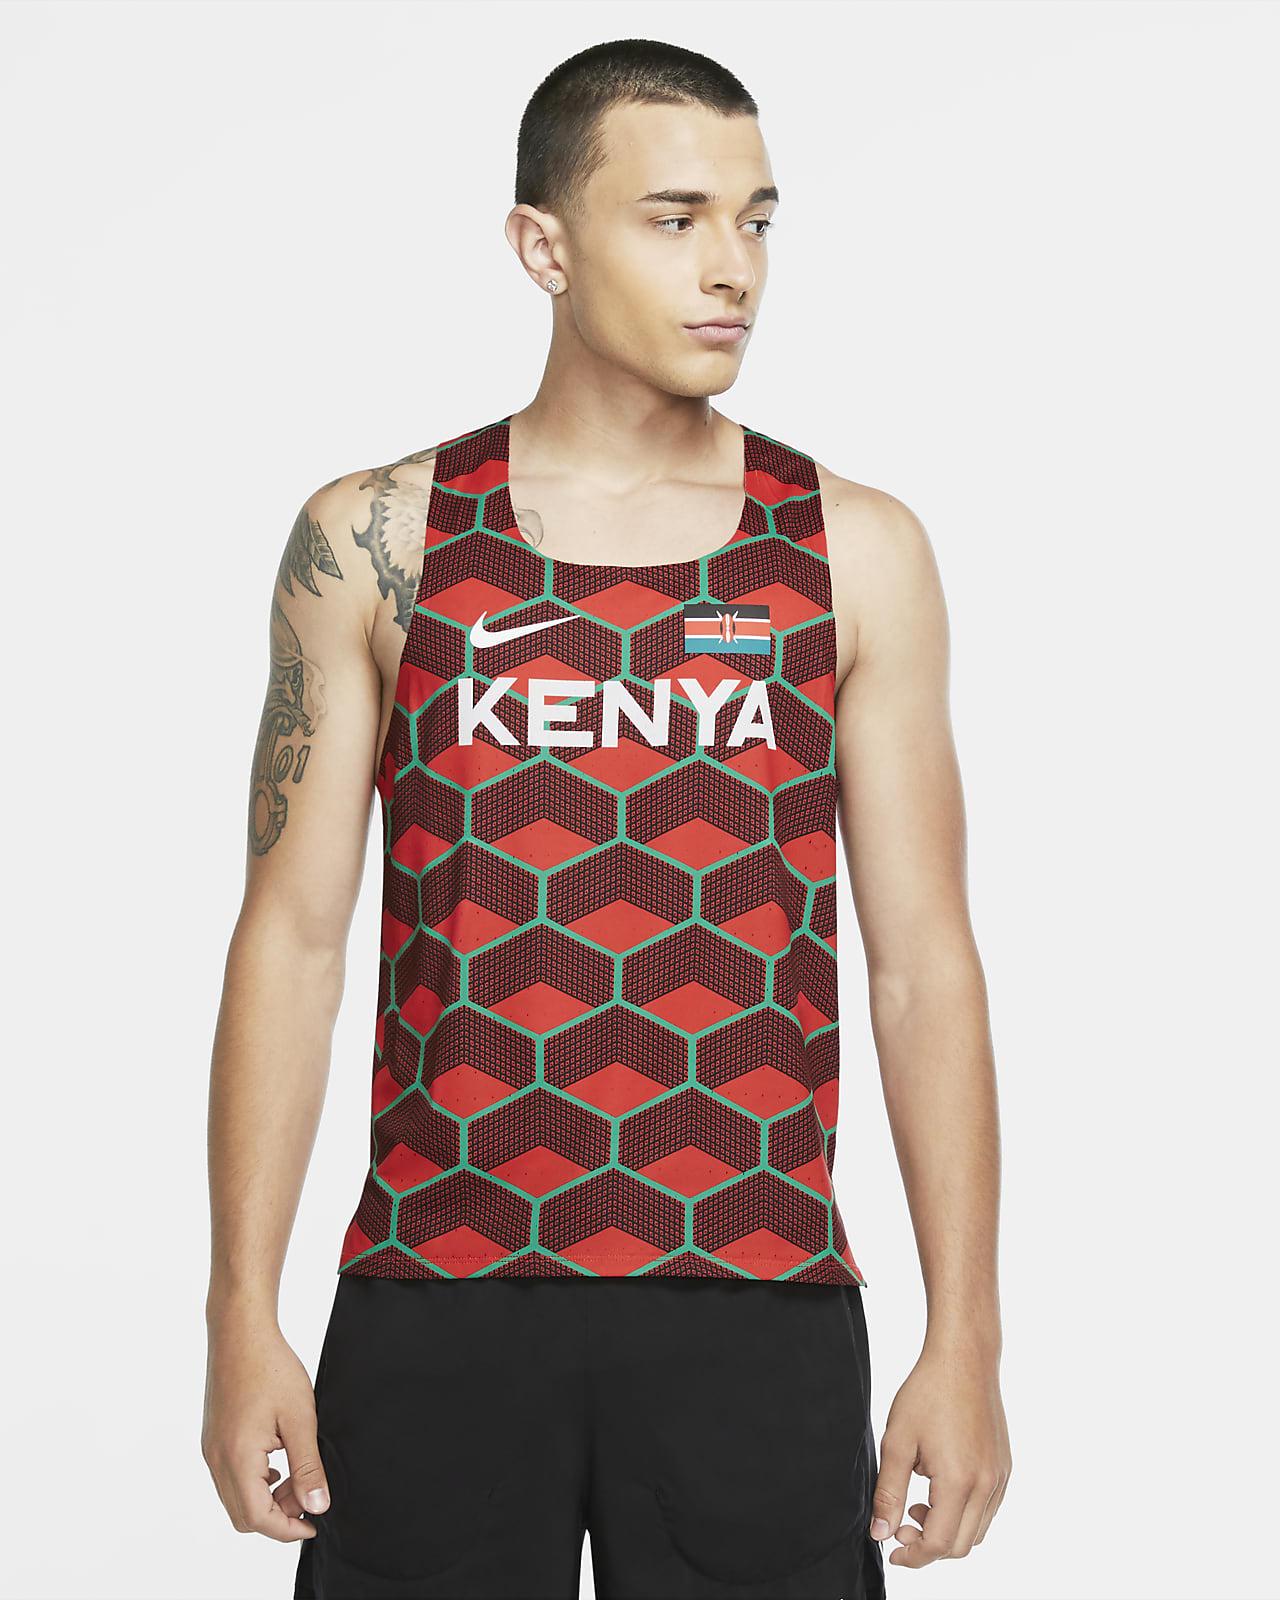 Haut de running Nike Dri-FIT ADV Team Kenya AeroSwift pour Homme